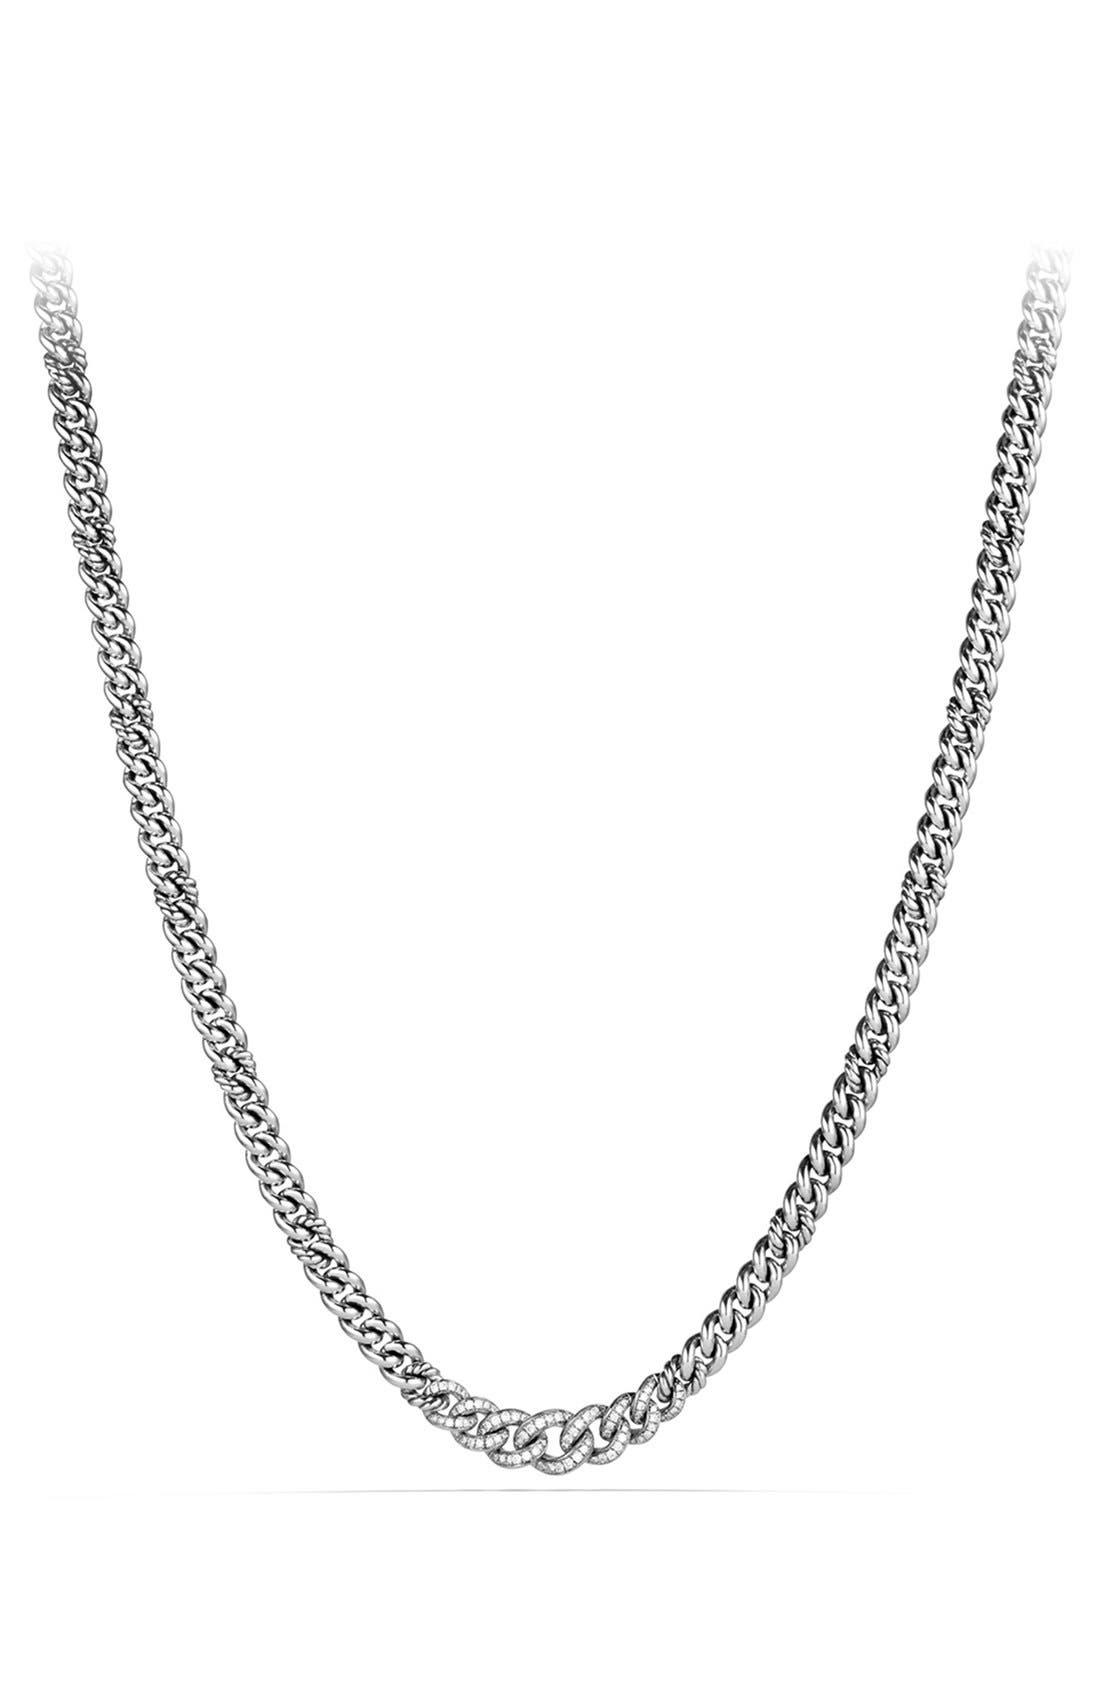 David Yurman 'Petite Pavé' Curb Chain Necklace with Diamonds